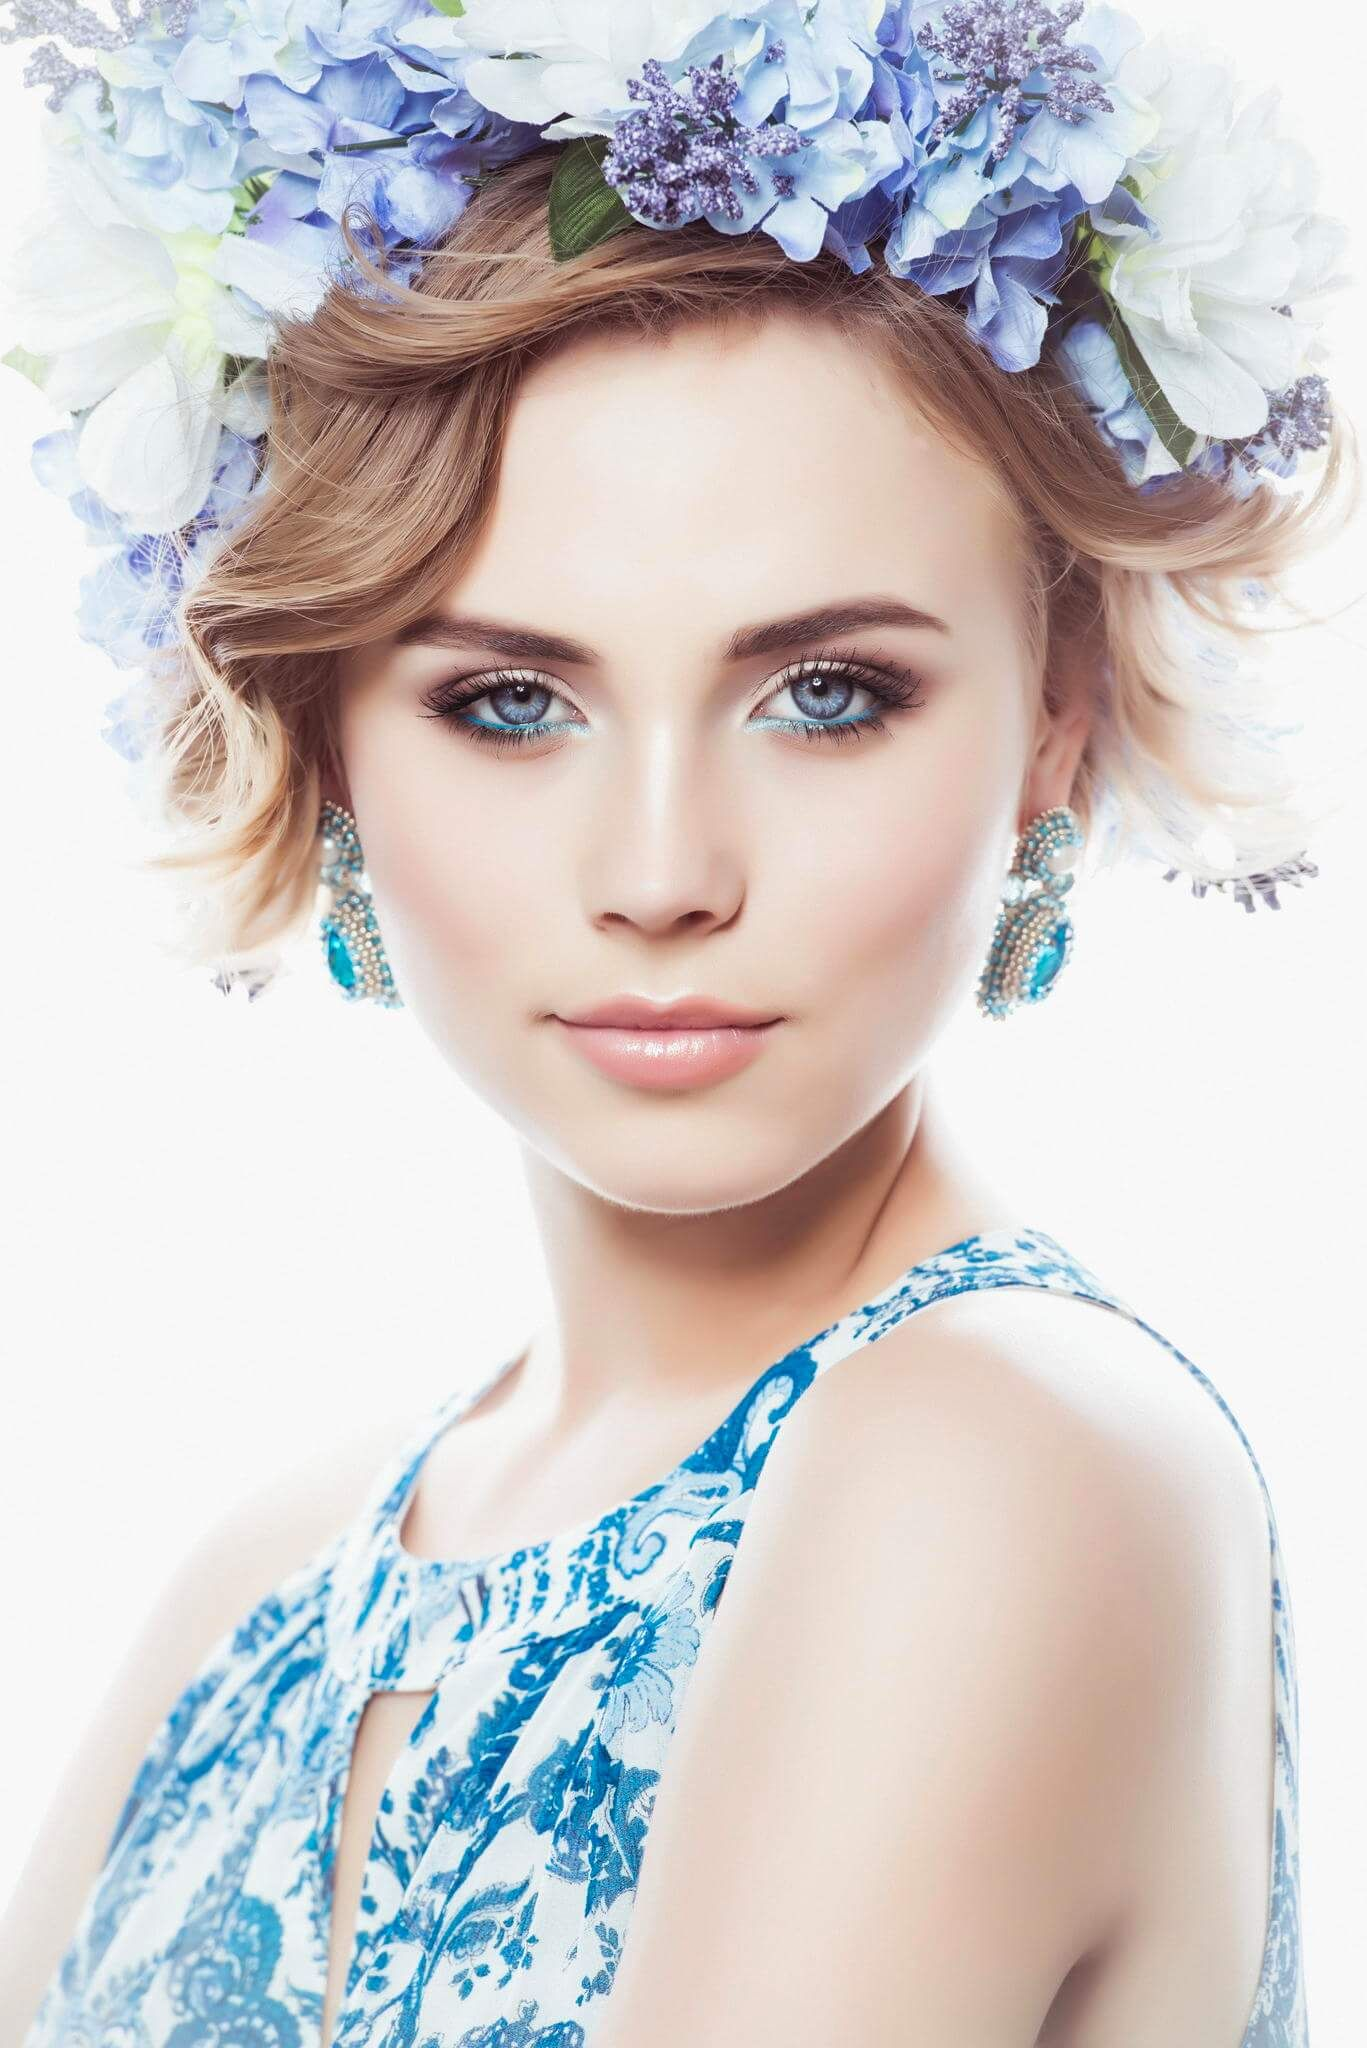 Most beautiful Ukrainian women - The Ultimate Dating Guide